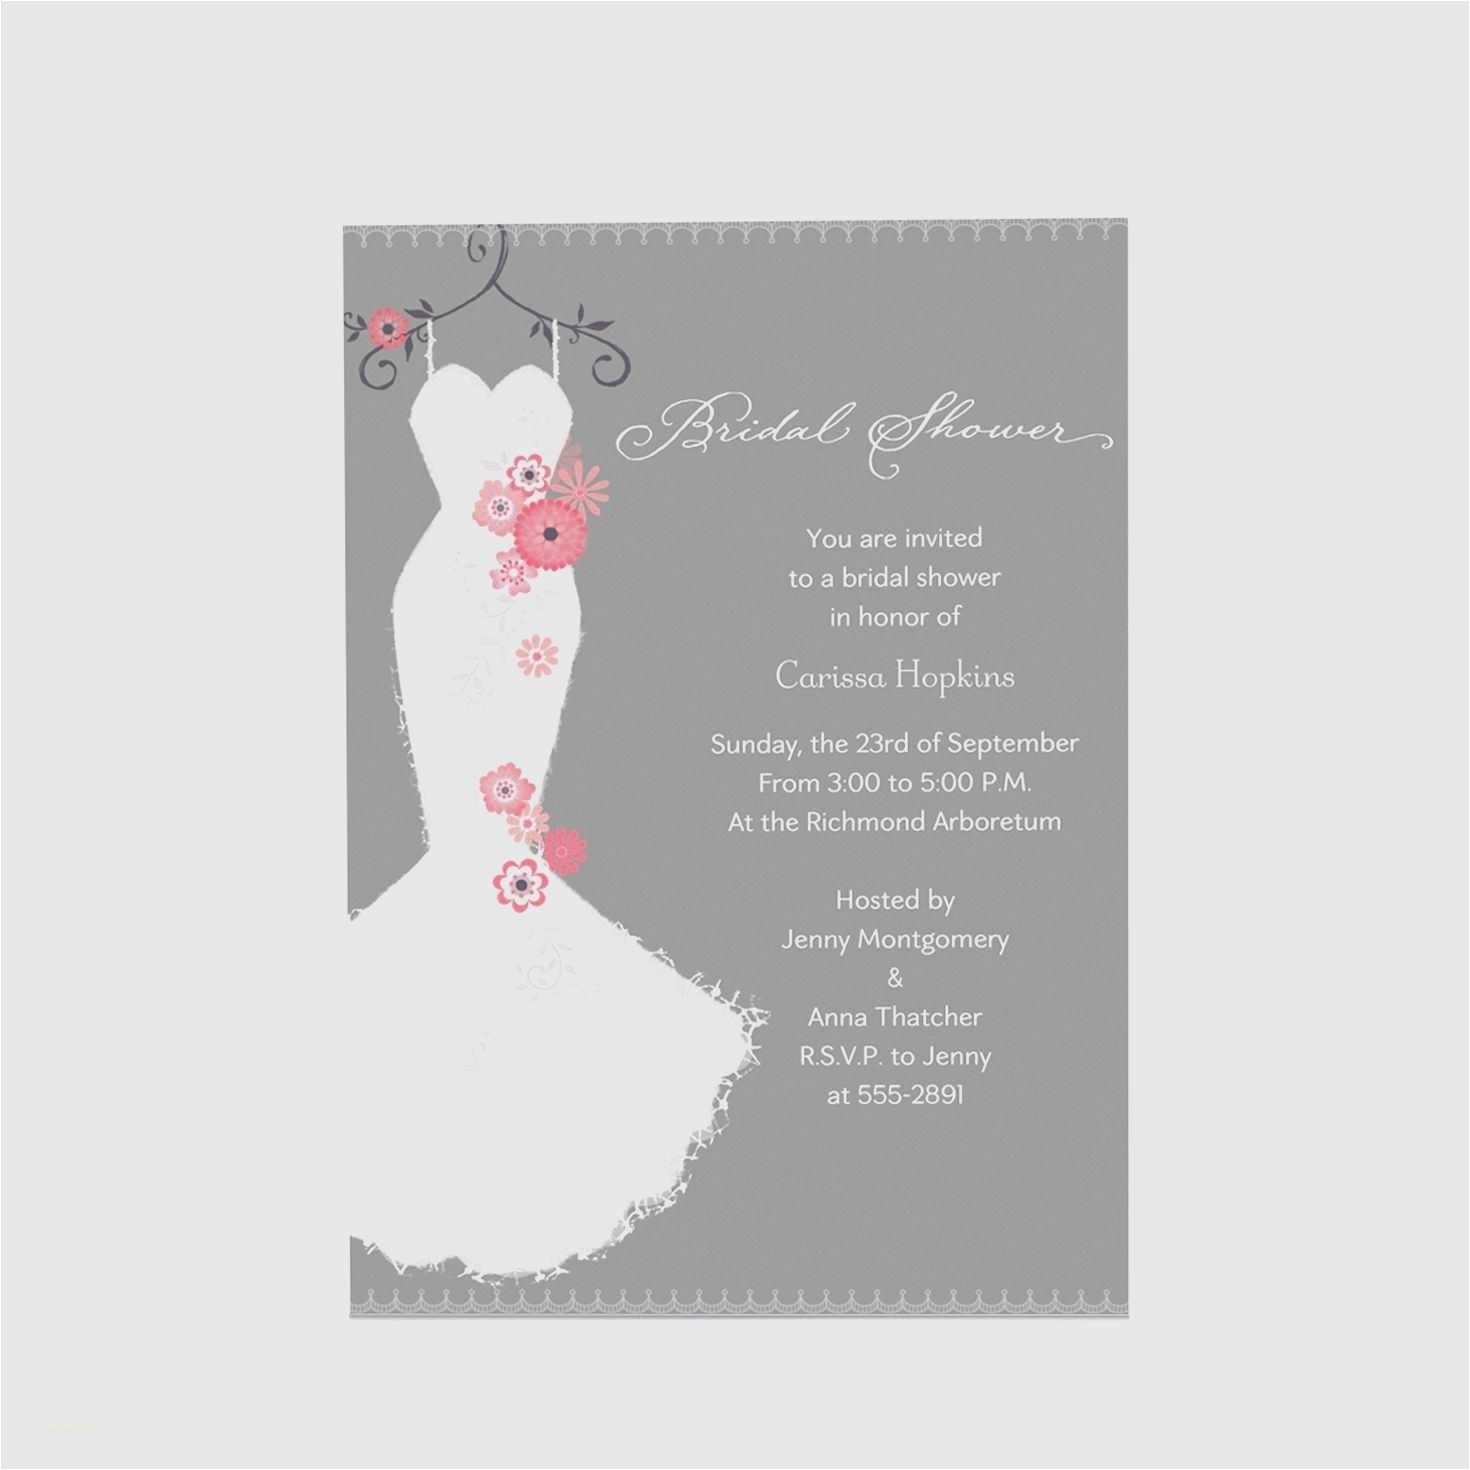 blank wedding shower invitations lovely bridal shower invitation wording for out of state bride